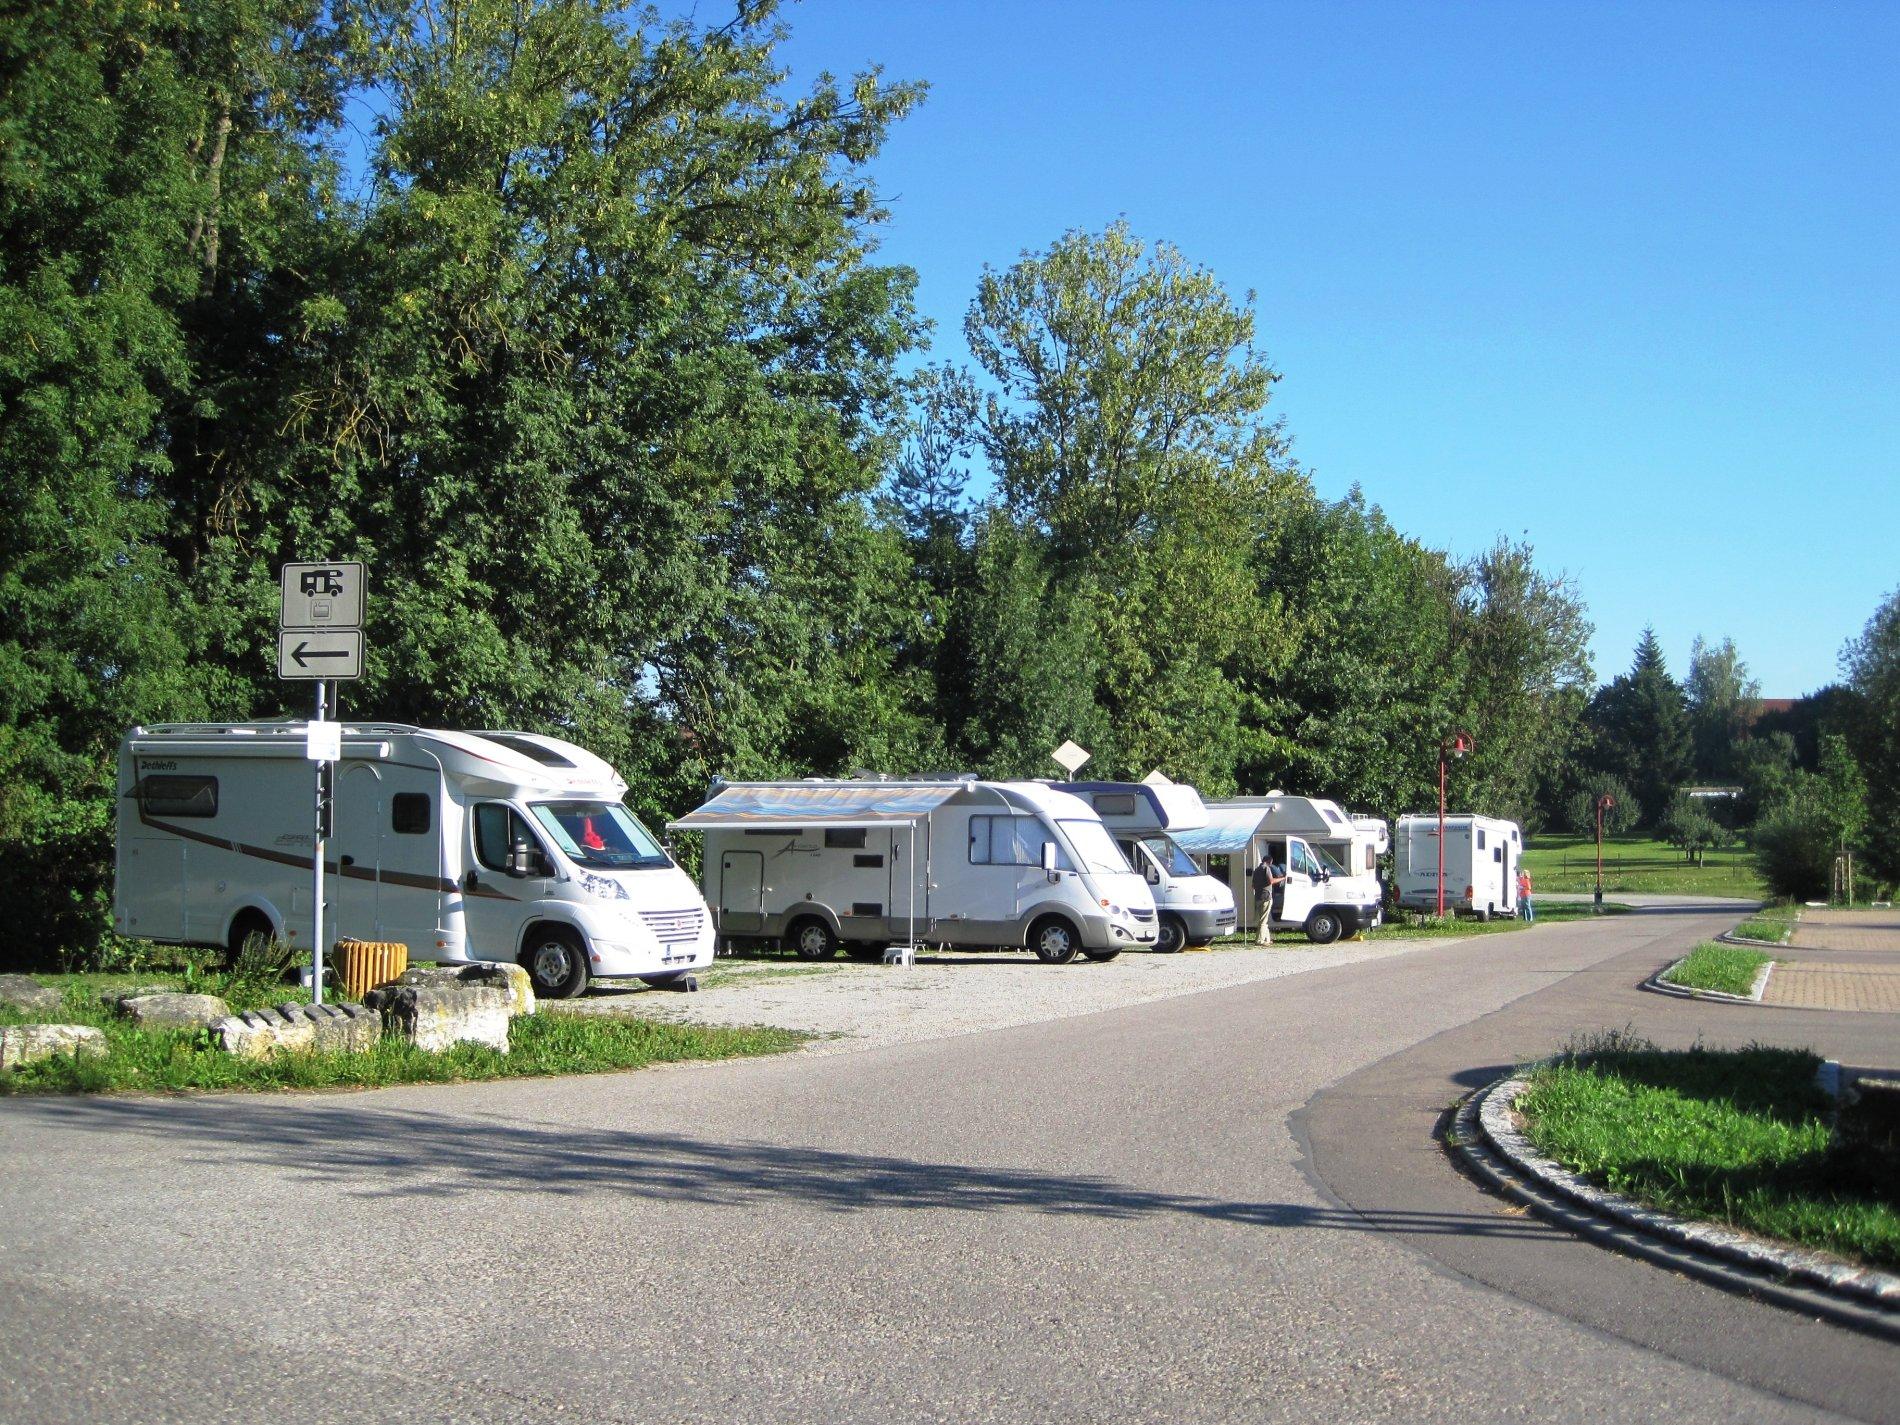 Reisemobilstellplatz Gaildorf